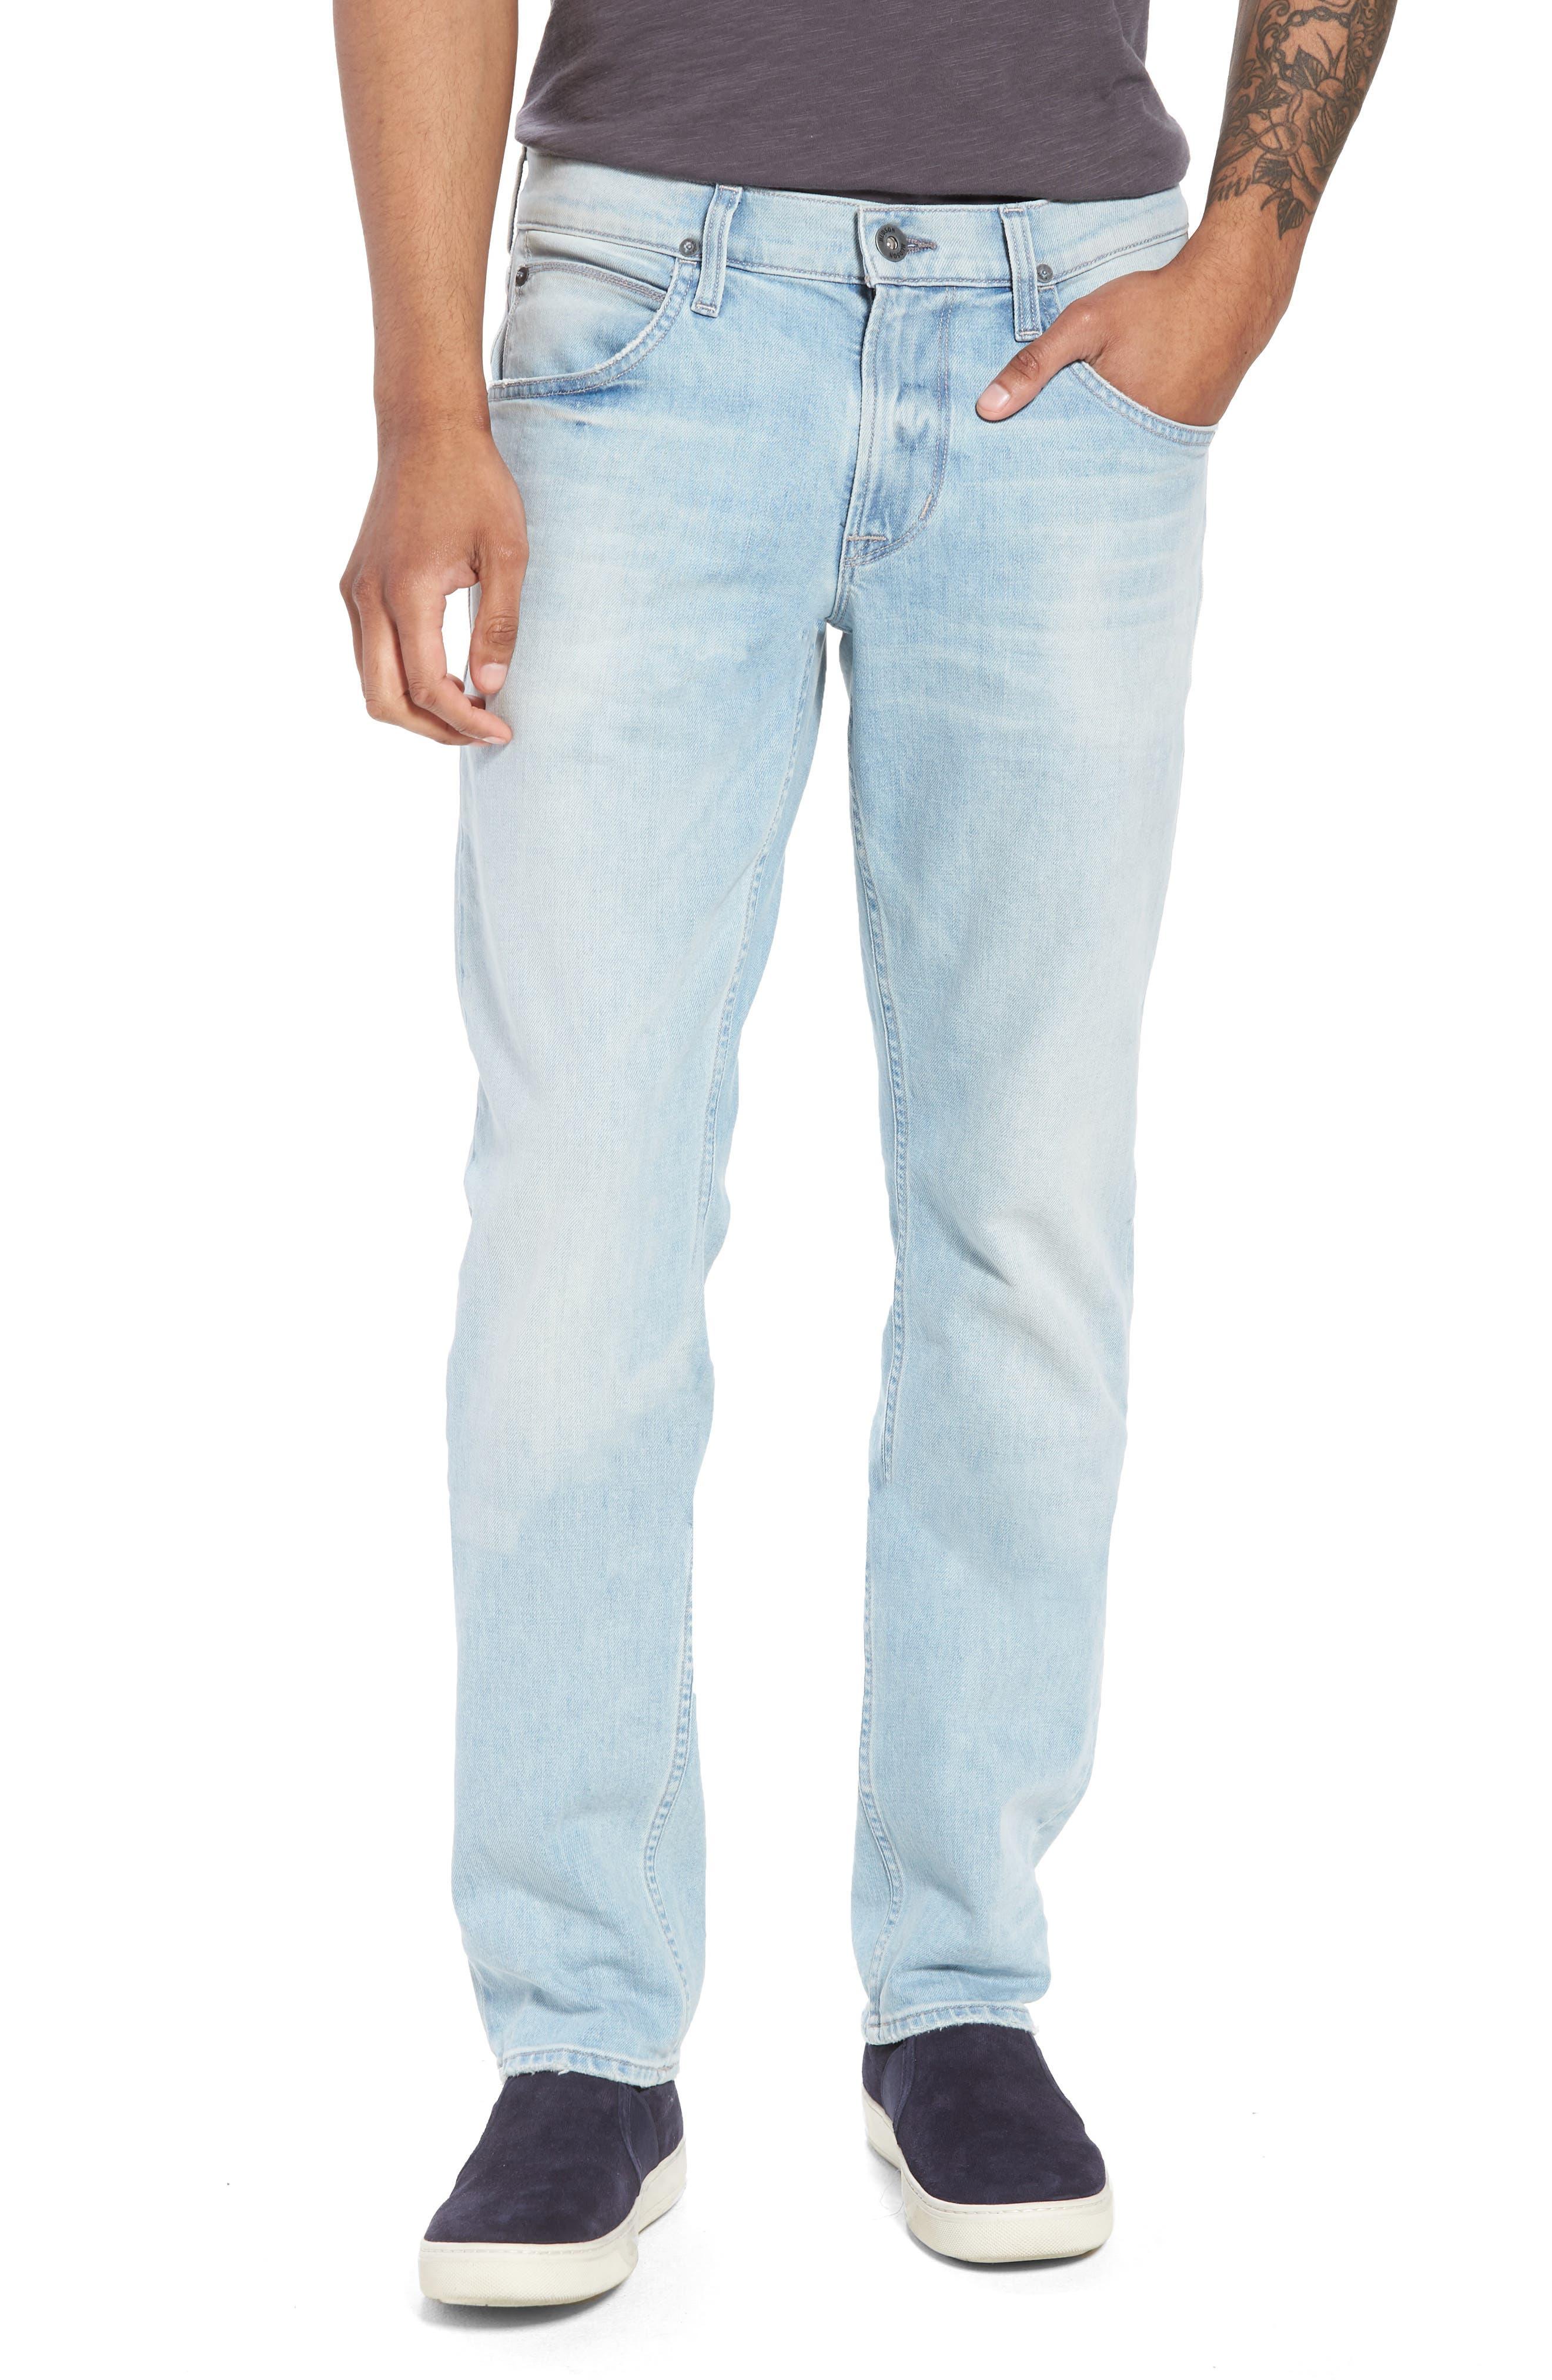 Blake Slim Fit Jeans,                         Main,                         color, Rewired